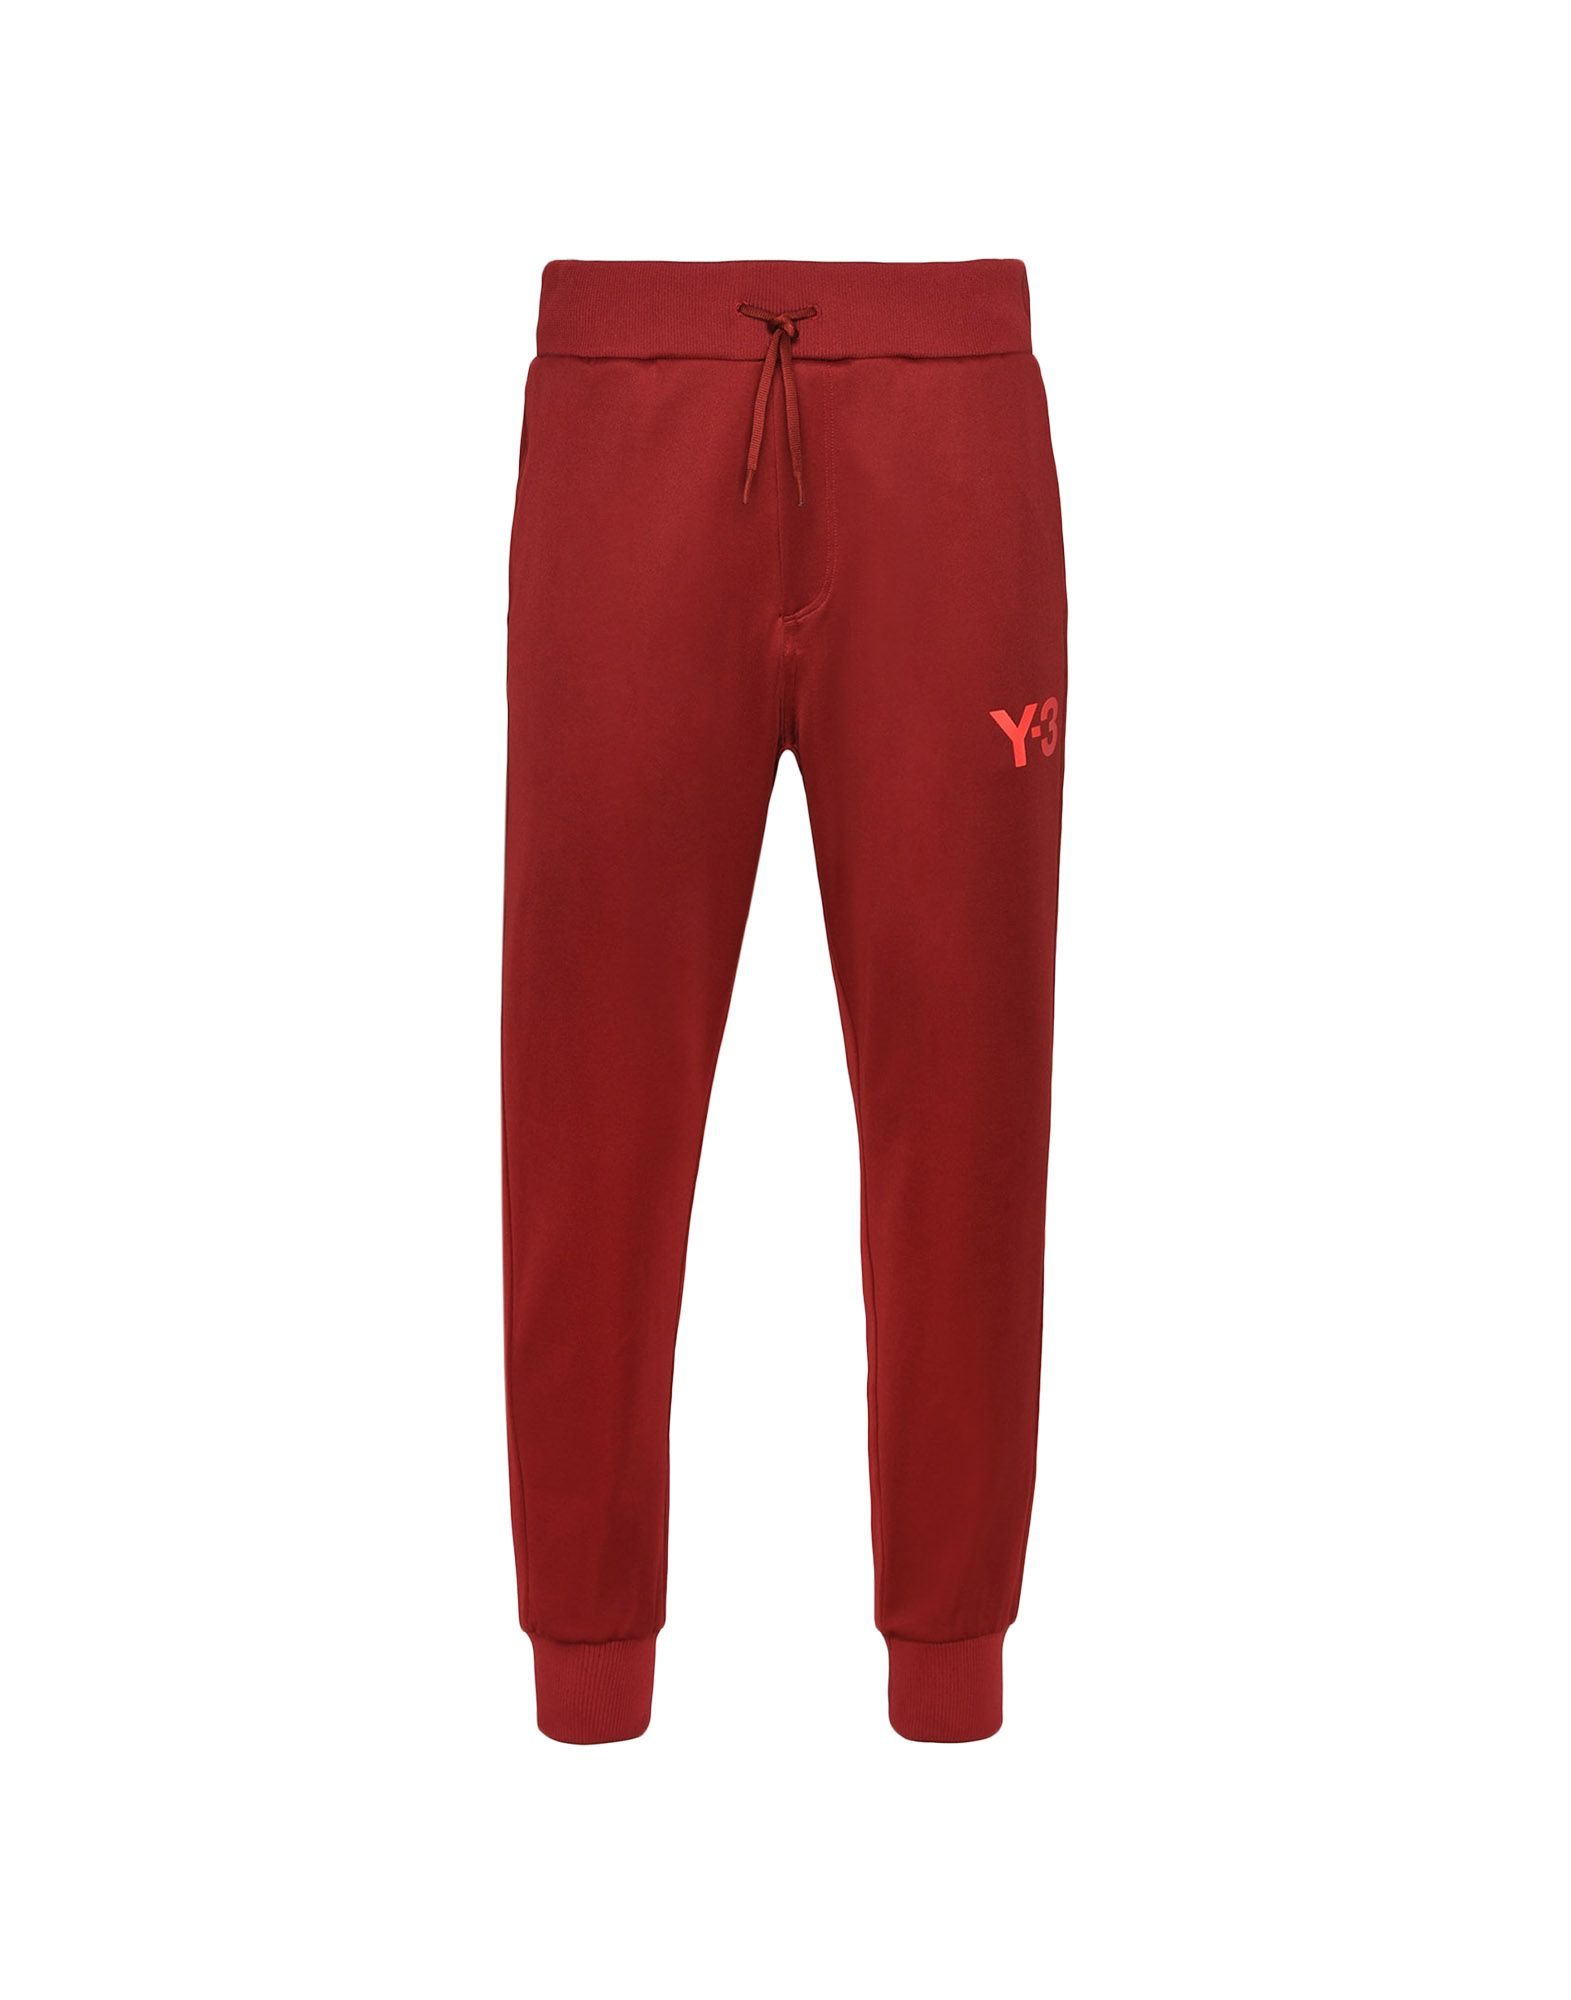 y 3 y 3 classic track pants track pant man f